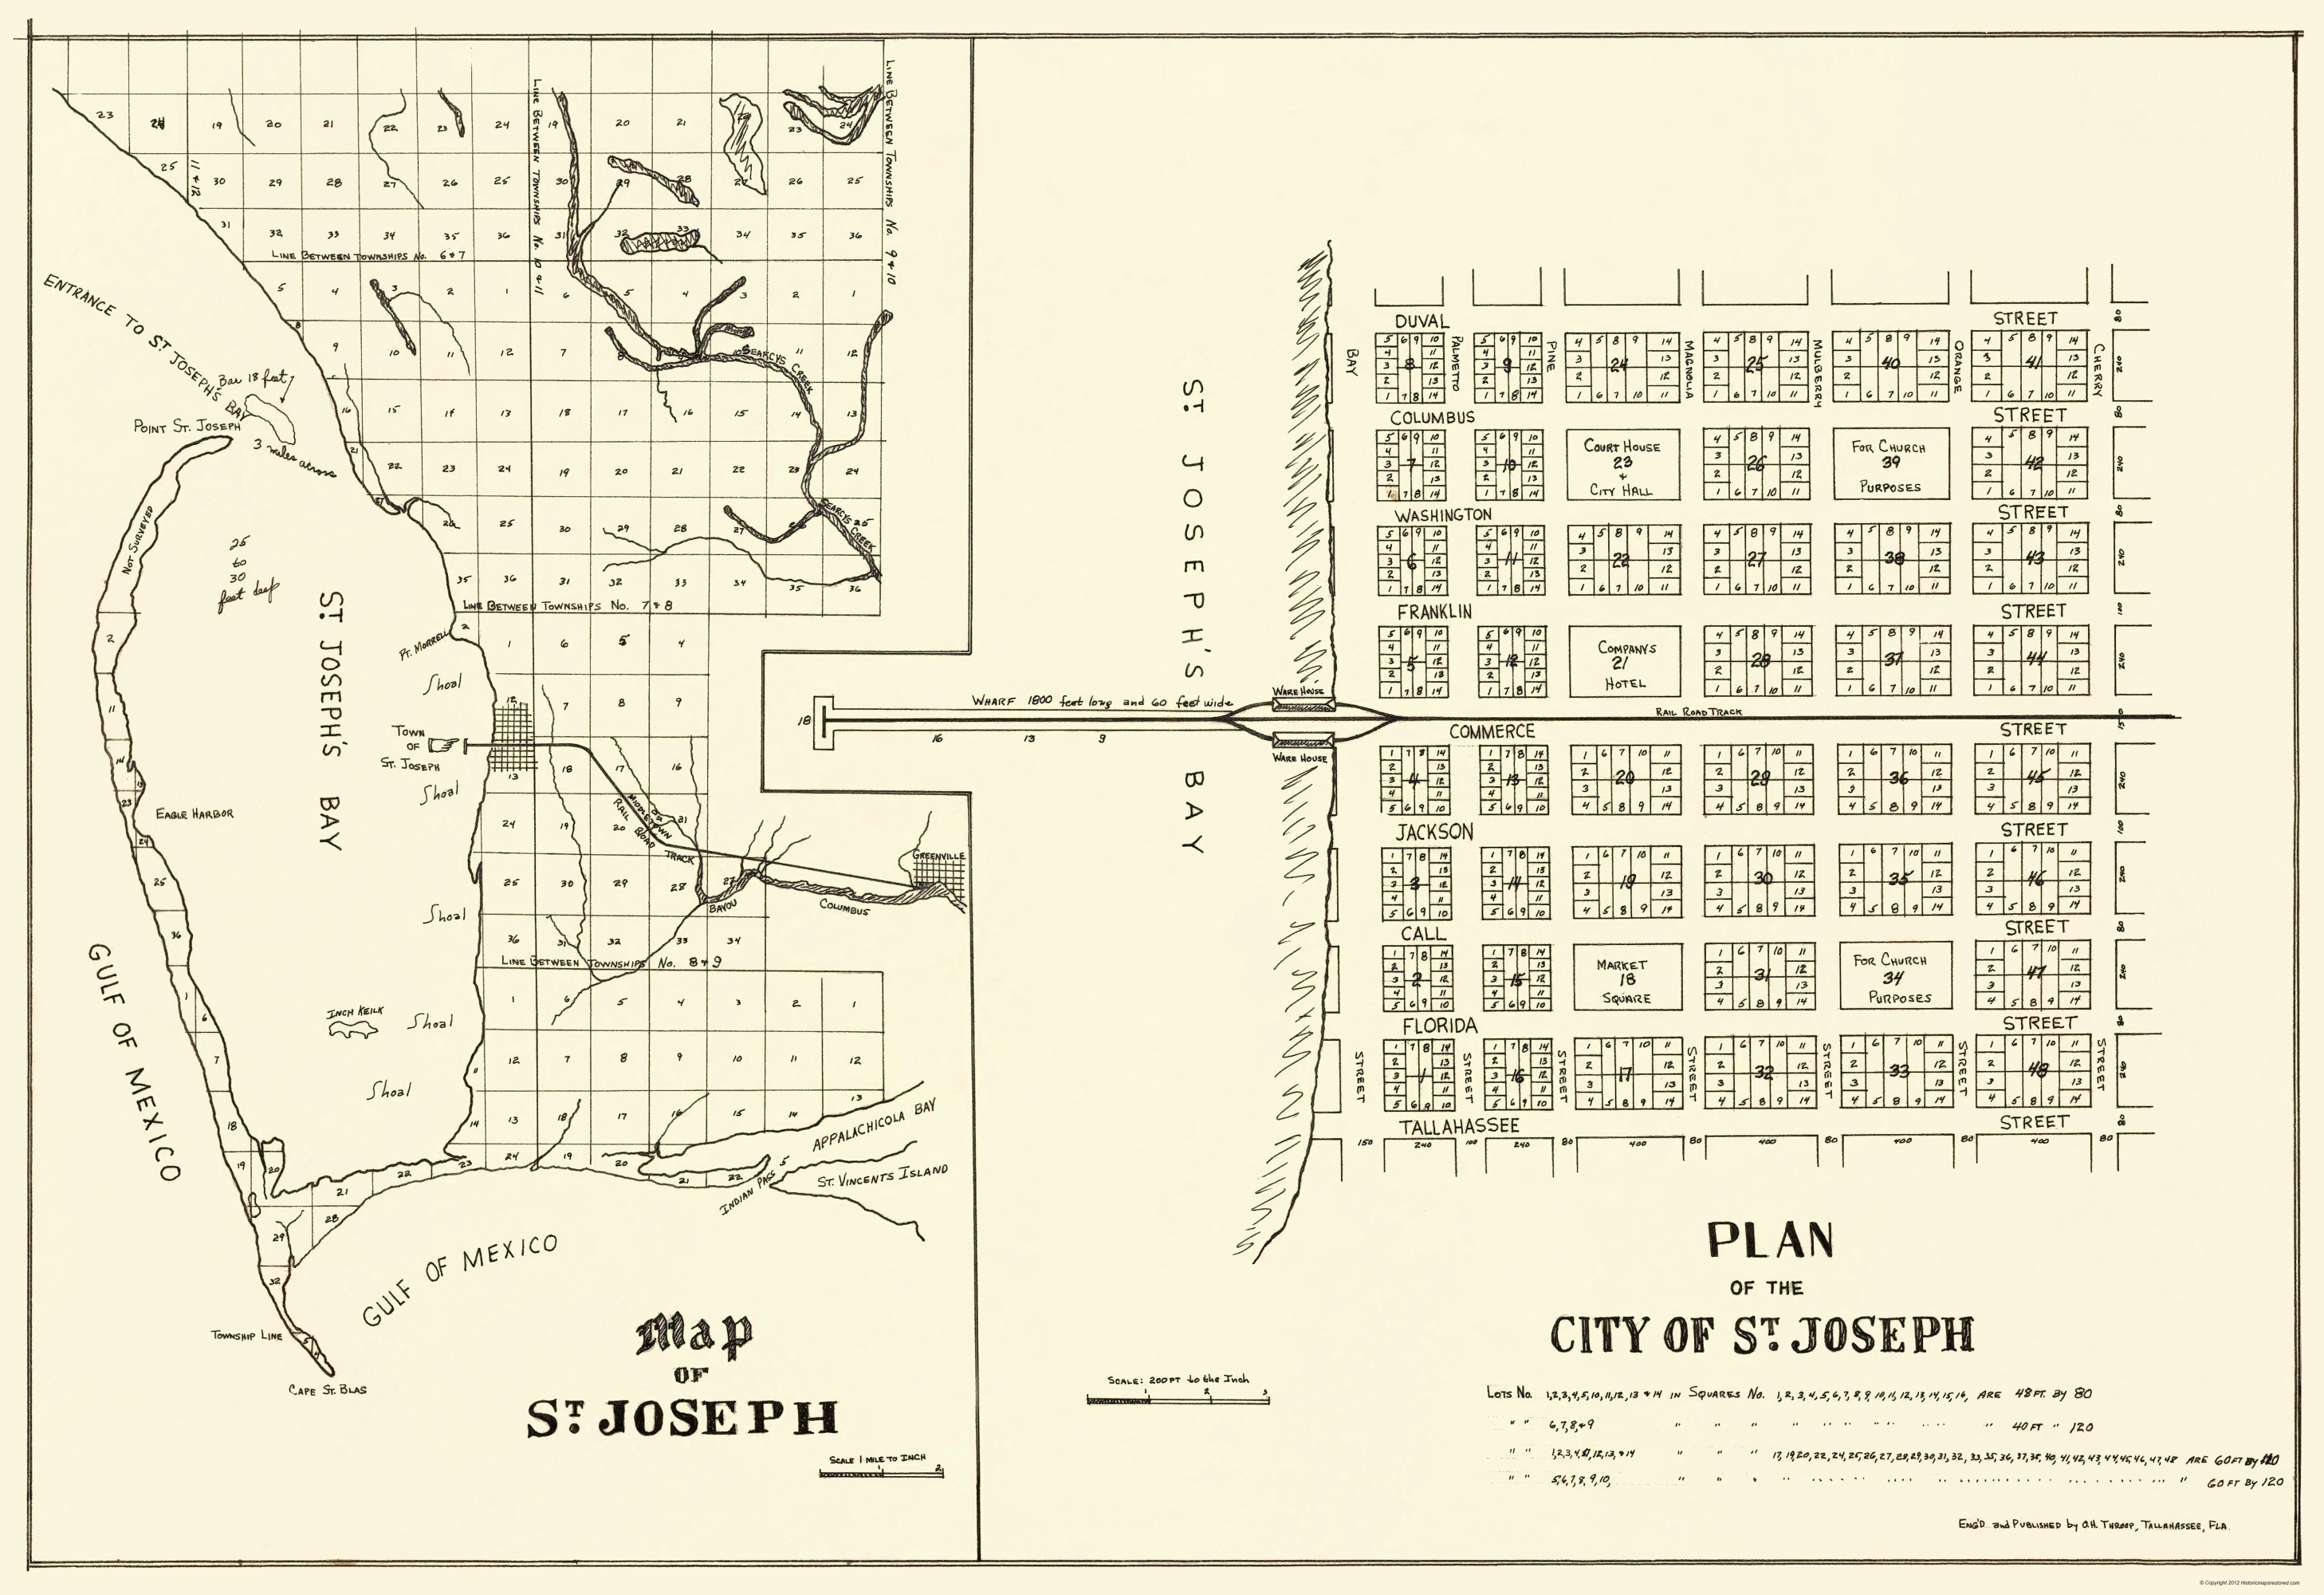 St Joe Florida Map.Old City Map St Joseph Florida Planning 1837